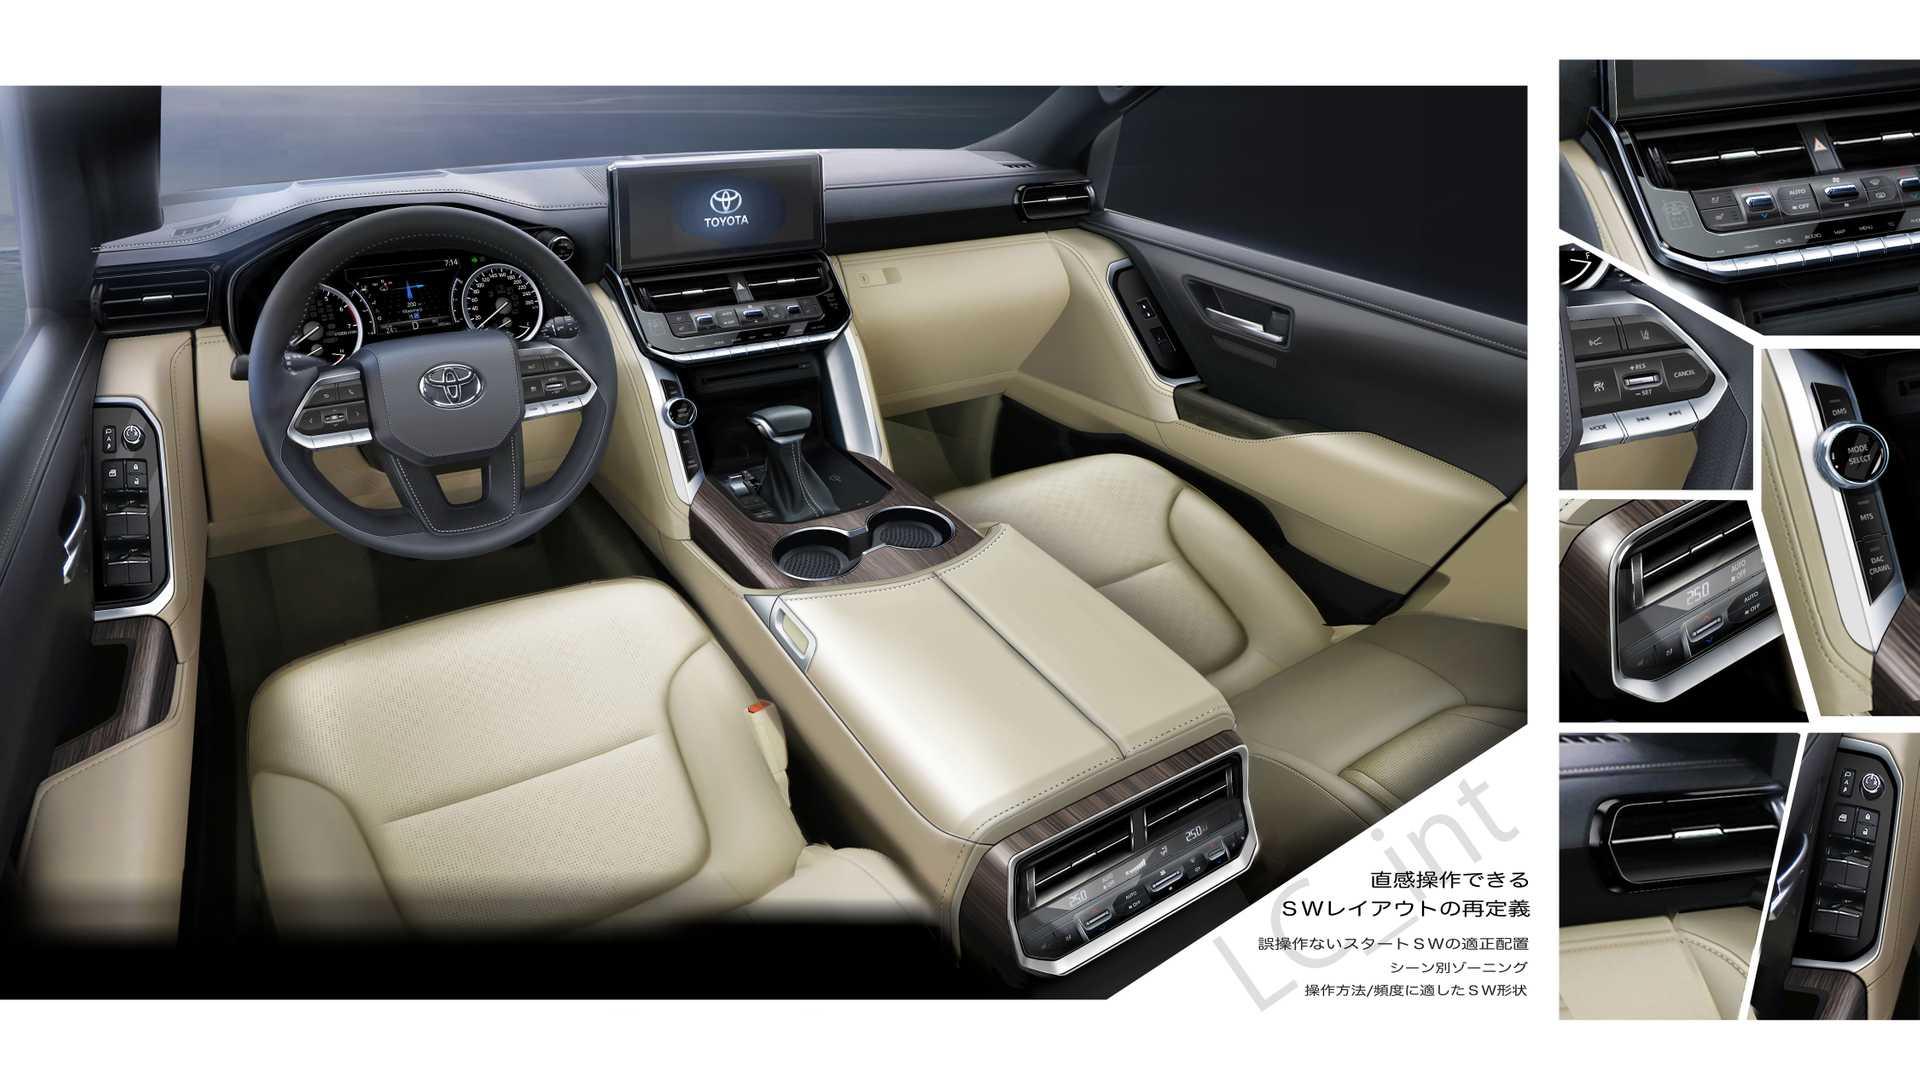 Toyota-Land-Cruiser-design-sketches-23